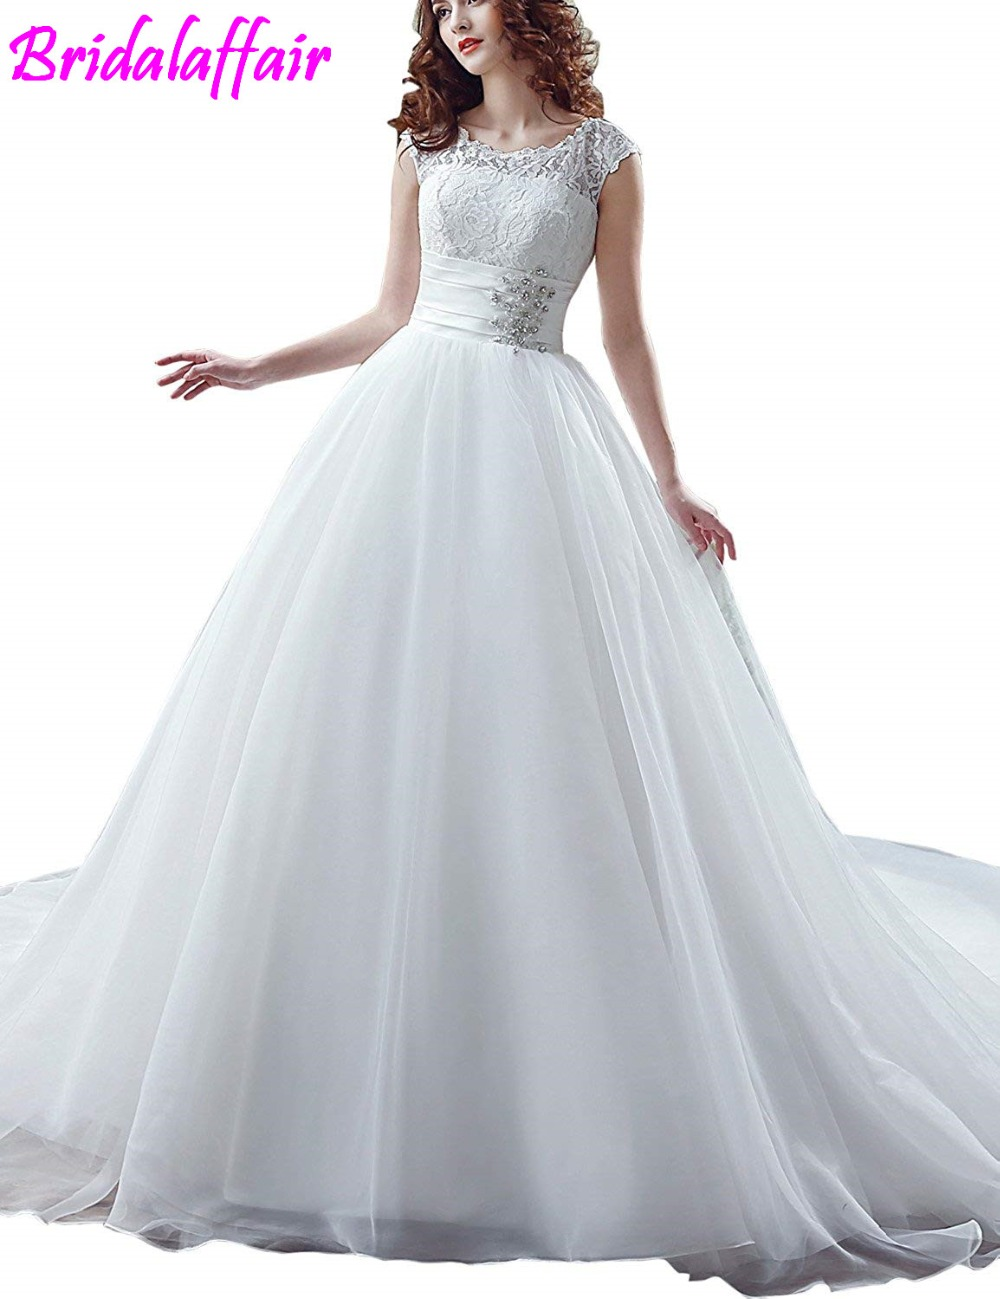 Women's Mermaid Chapel Train Wedding Dress Lace Bridal Gown Vestido De Festa Longo Cheap Wedding Dresses With Free Shipping